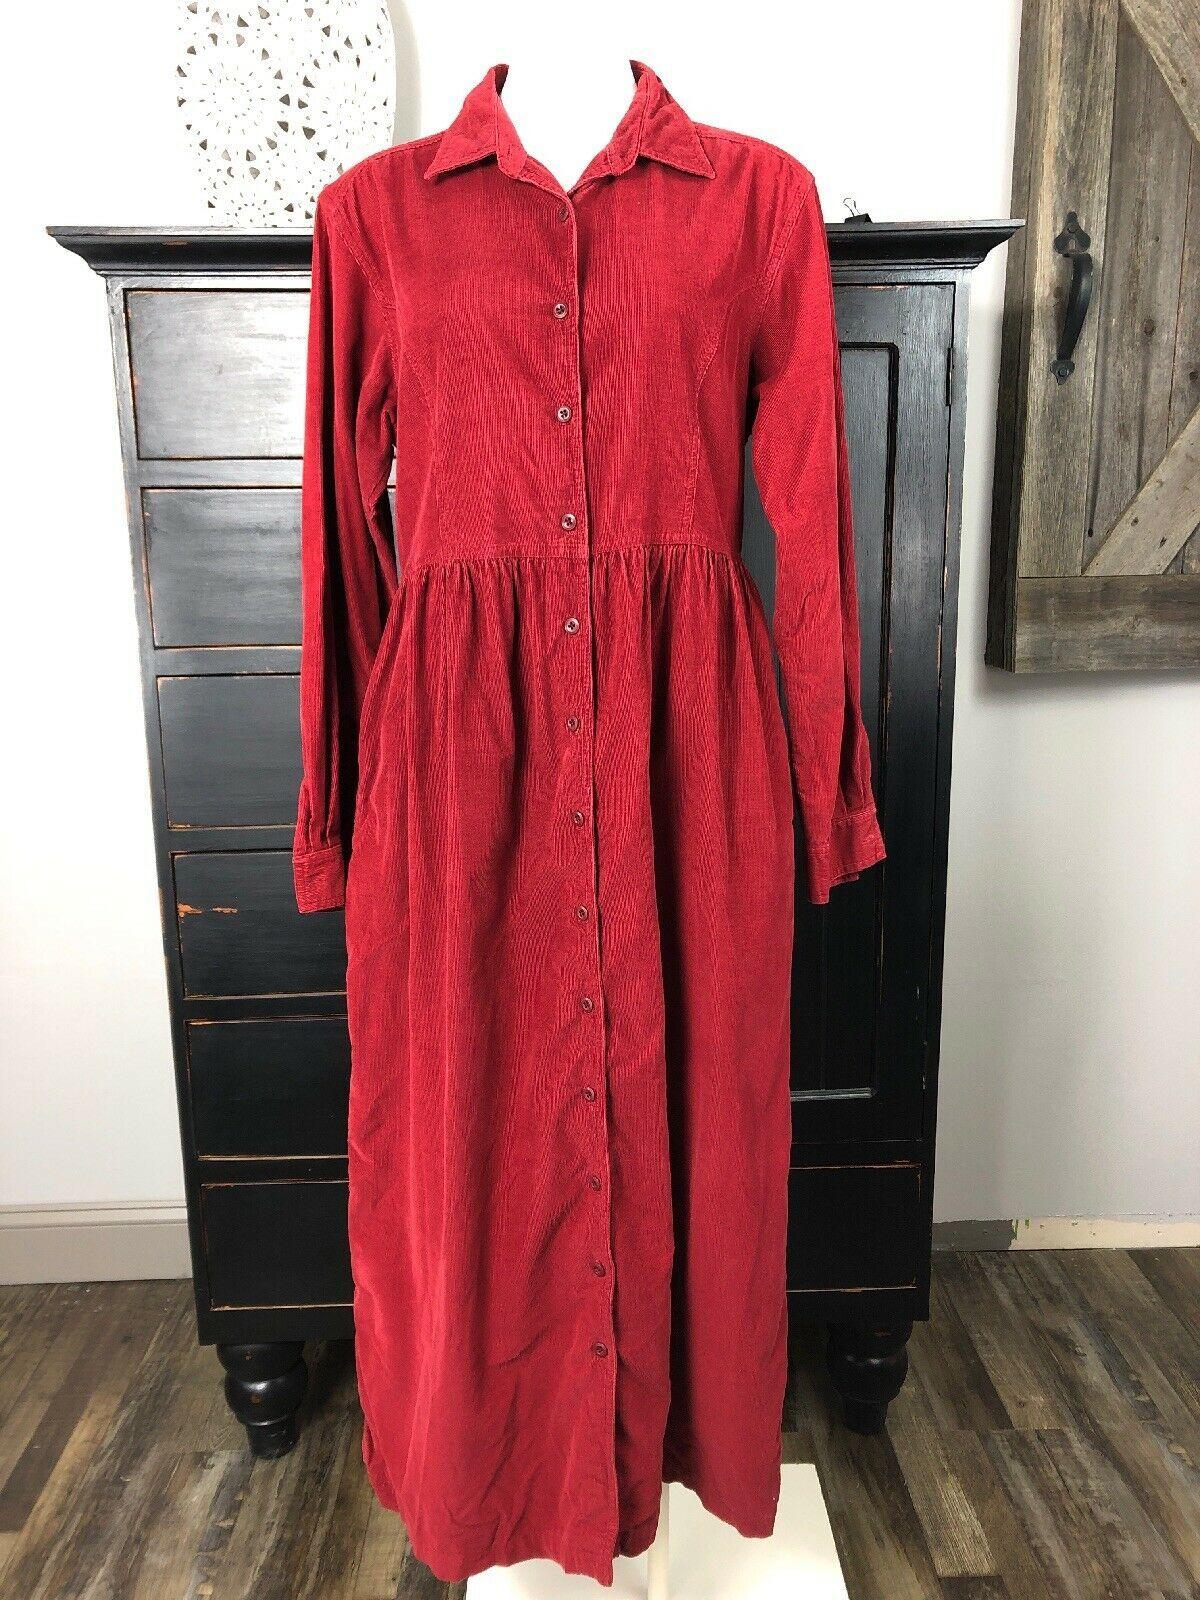 Ll Bean Womens 10 Red Corduroy 100 Cotton Button Front Midi Modest Shirt Dress Corduroy Dresses I Polka Dot Shirt Dress Modest Maxi Dress Trending Dresses [ 1600 x 1200 Pixel ]